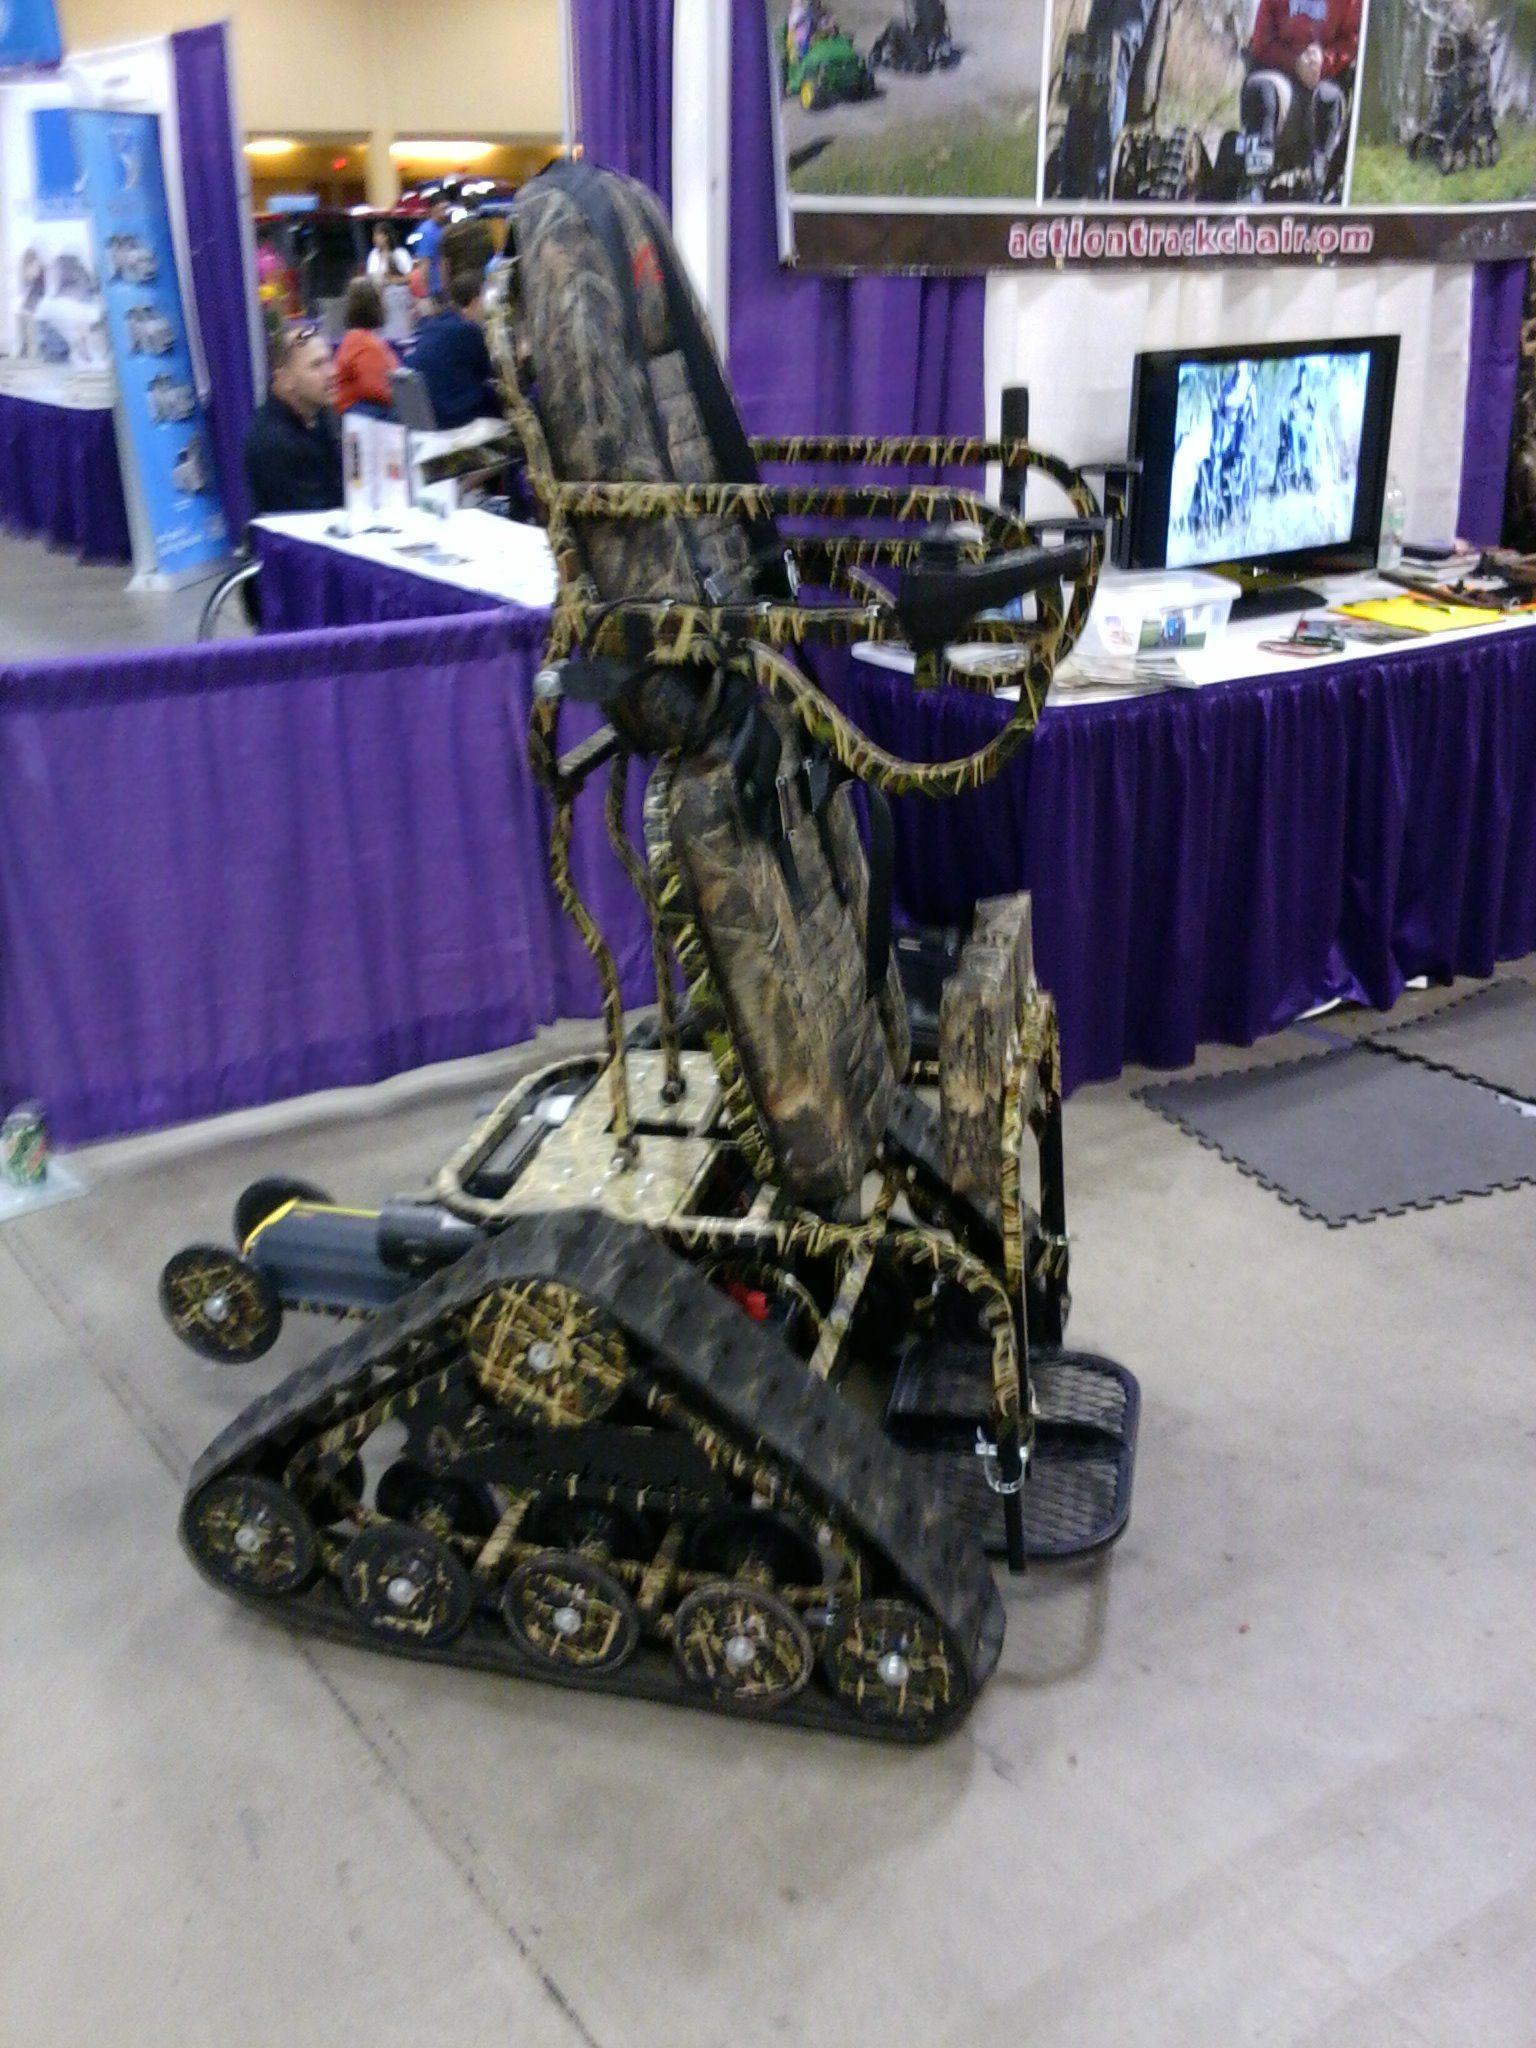 tank chair wheelchair cheap bar chairs all terrain camo 39d up powered standing notice